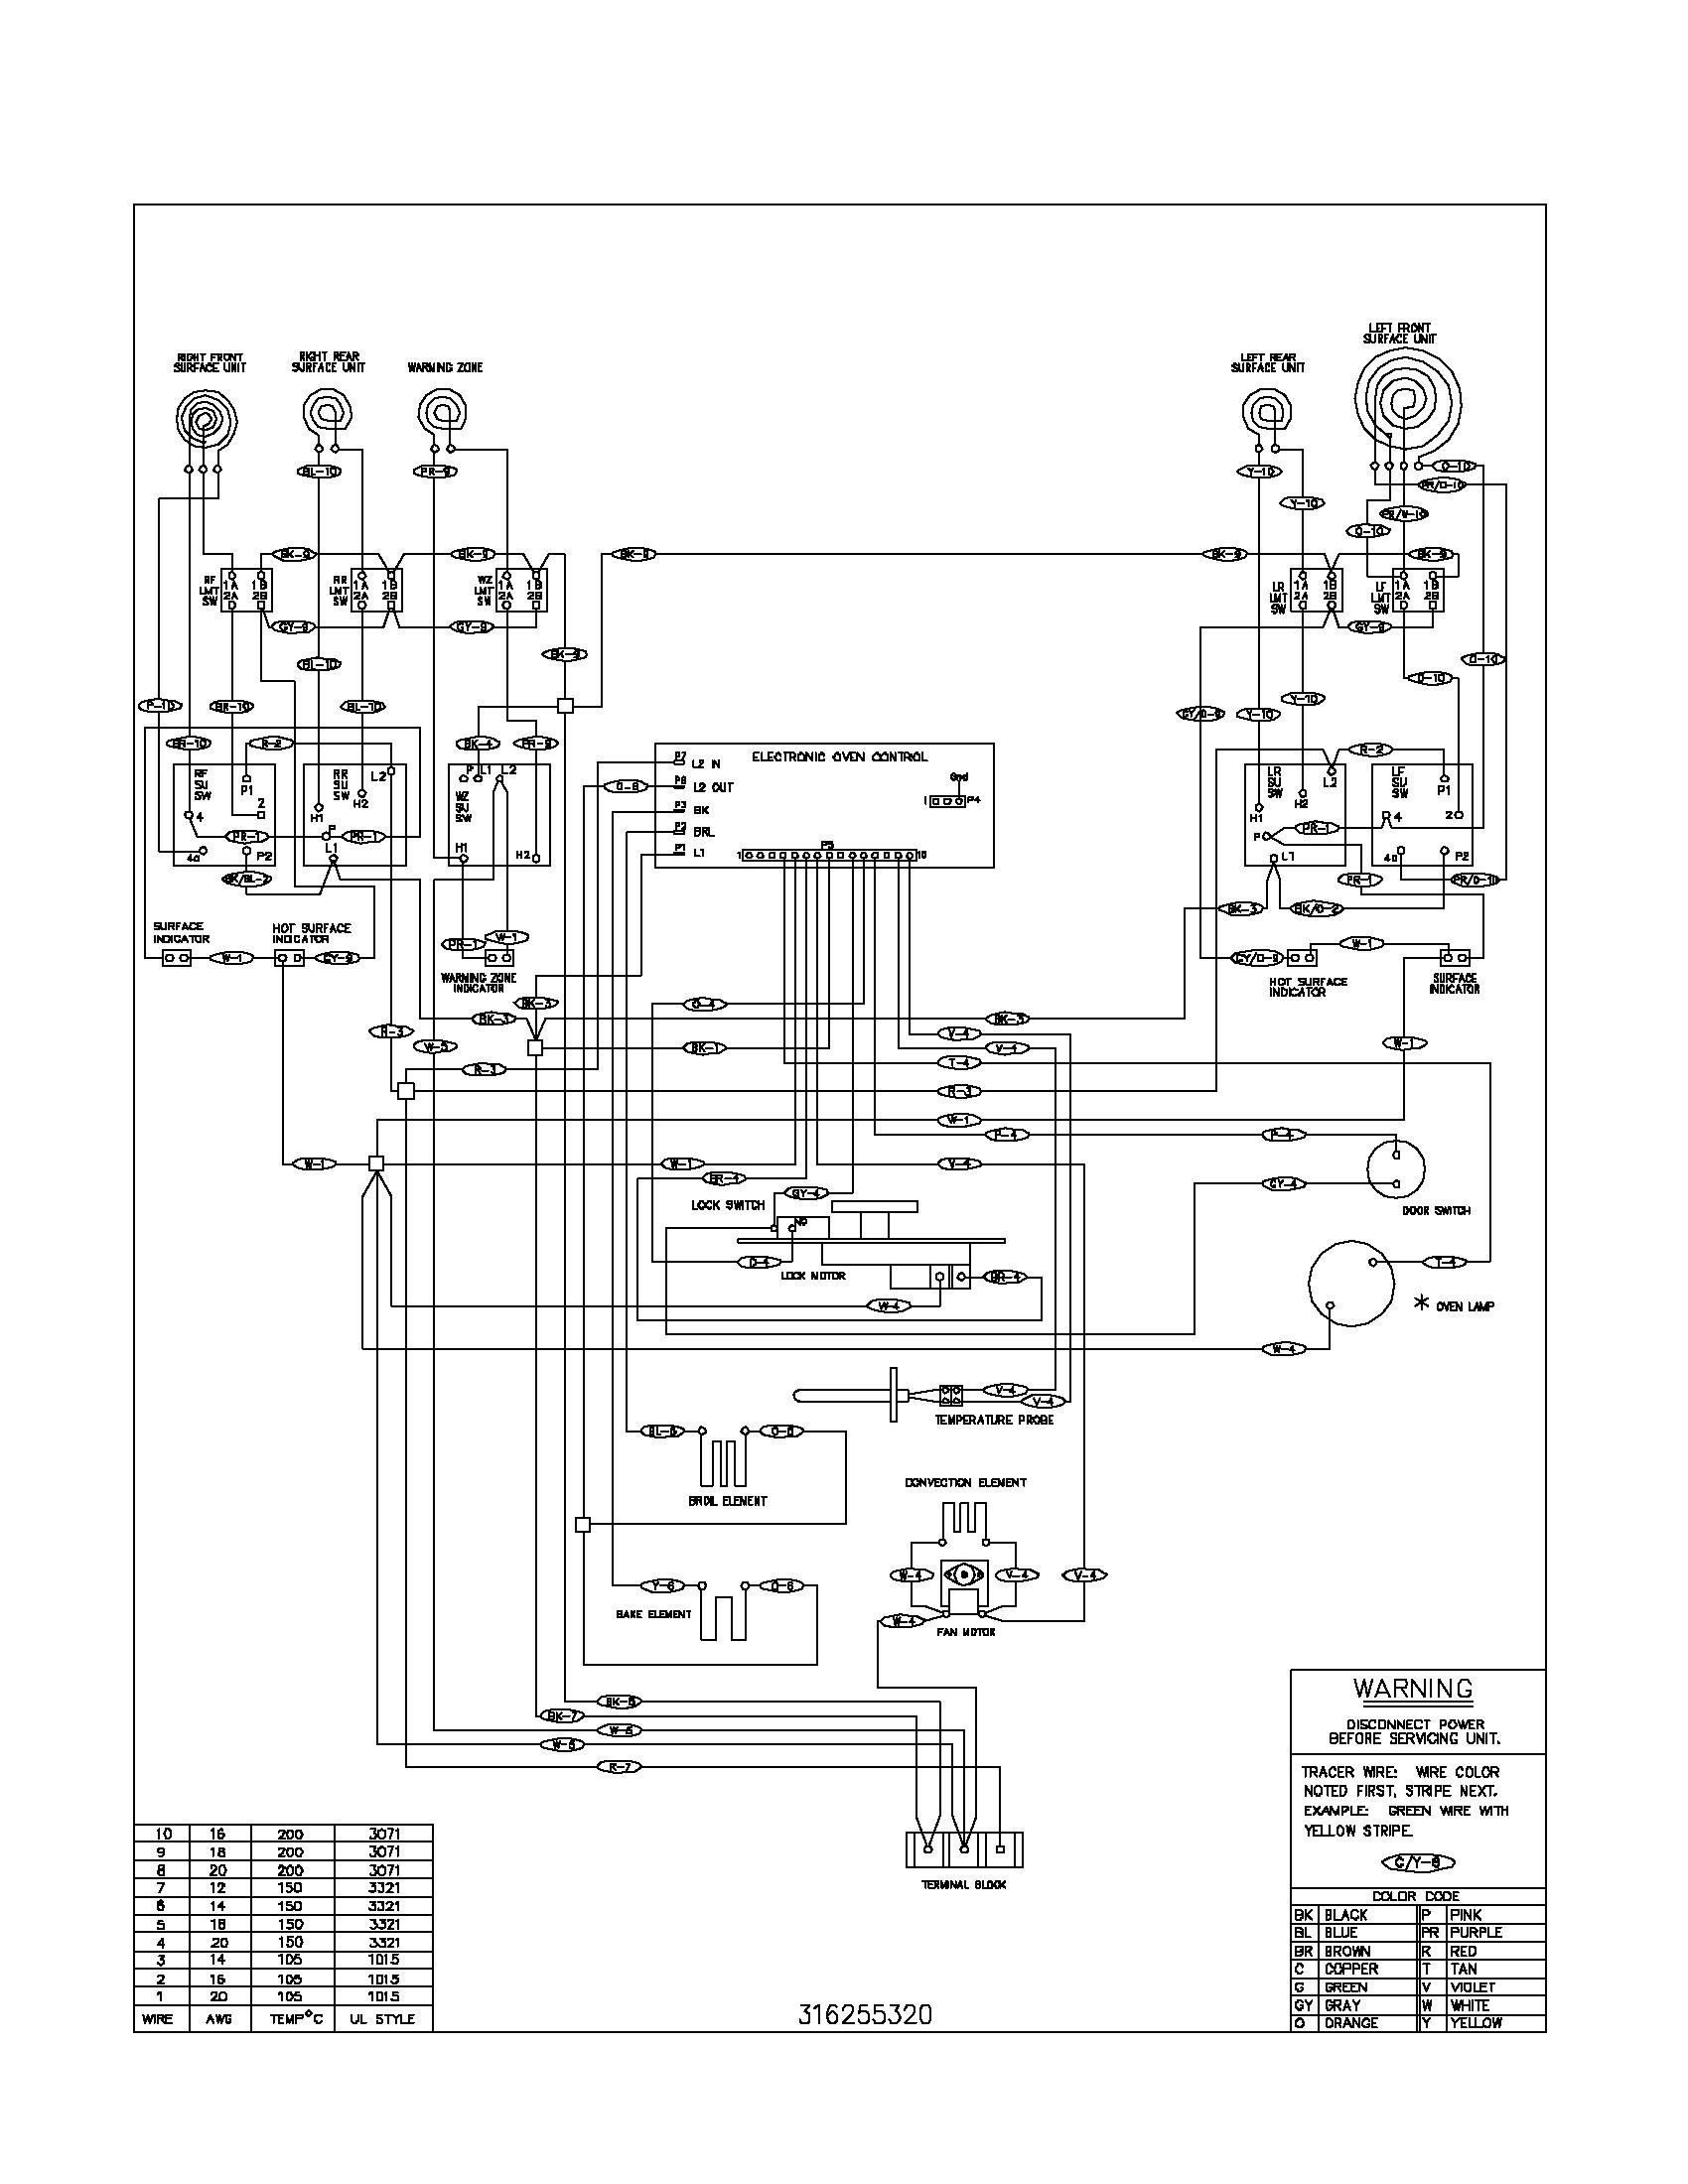 Whirlpool Fridge Wiring Diagram Simple Ge Refrigerator Wiring Diagram Ice Maker Fresh Wx15x12 1 2 Od Flared